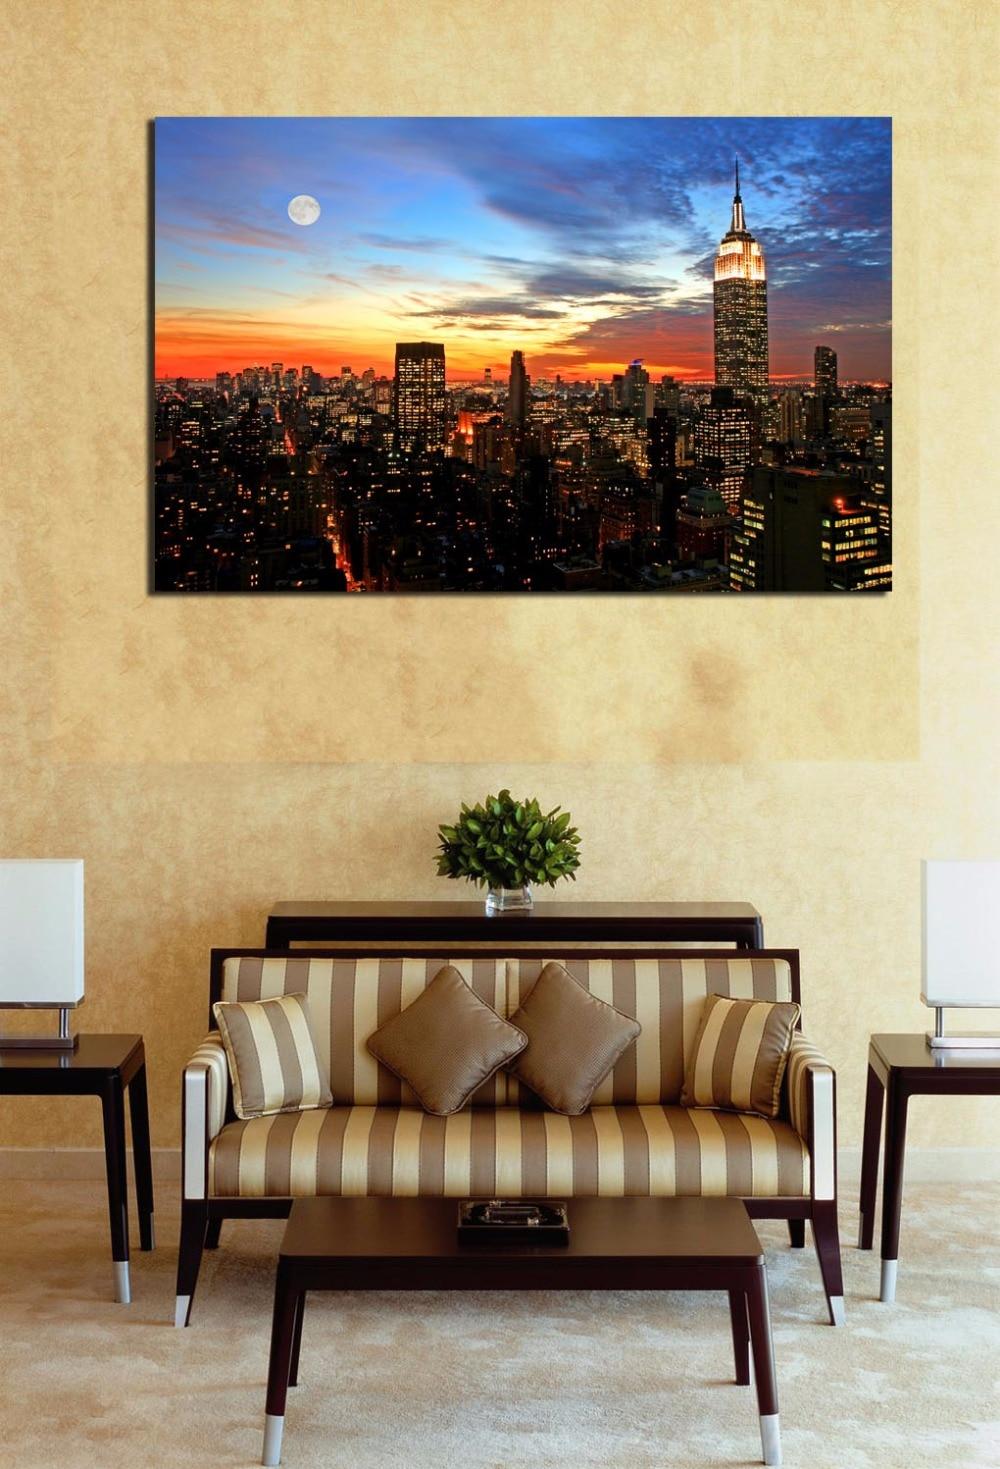 Sunset Cityscape High rise Building Painting Oil Canvas Print Art ...